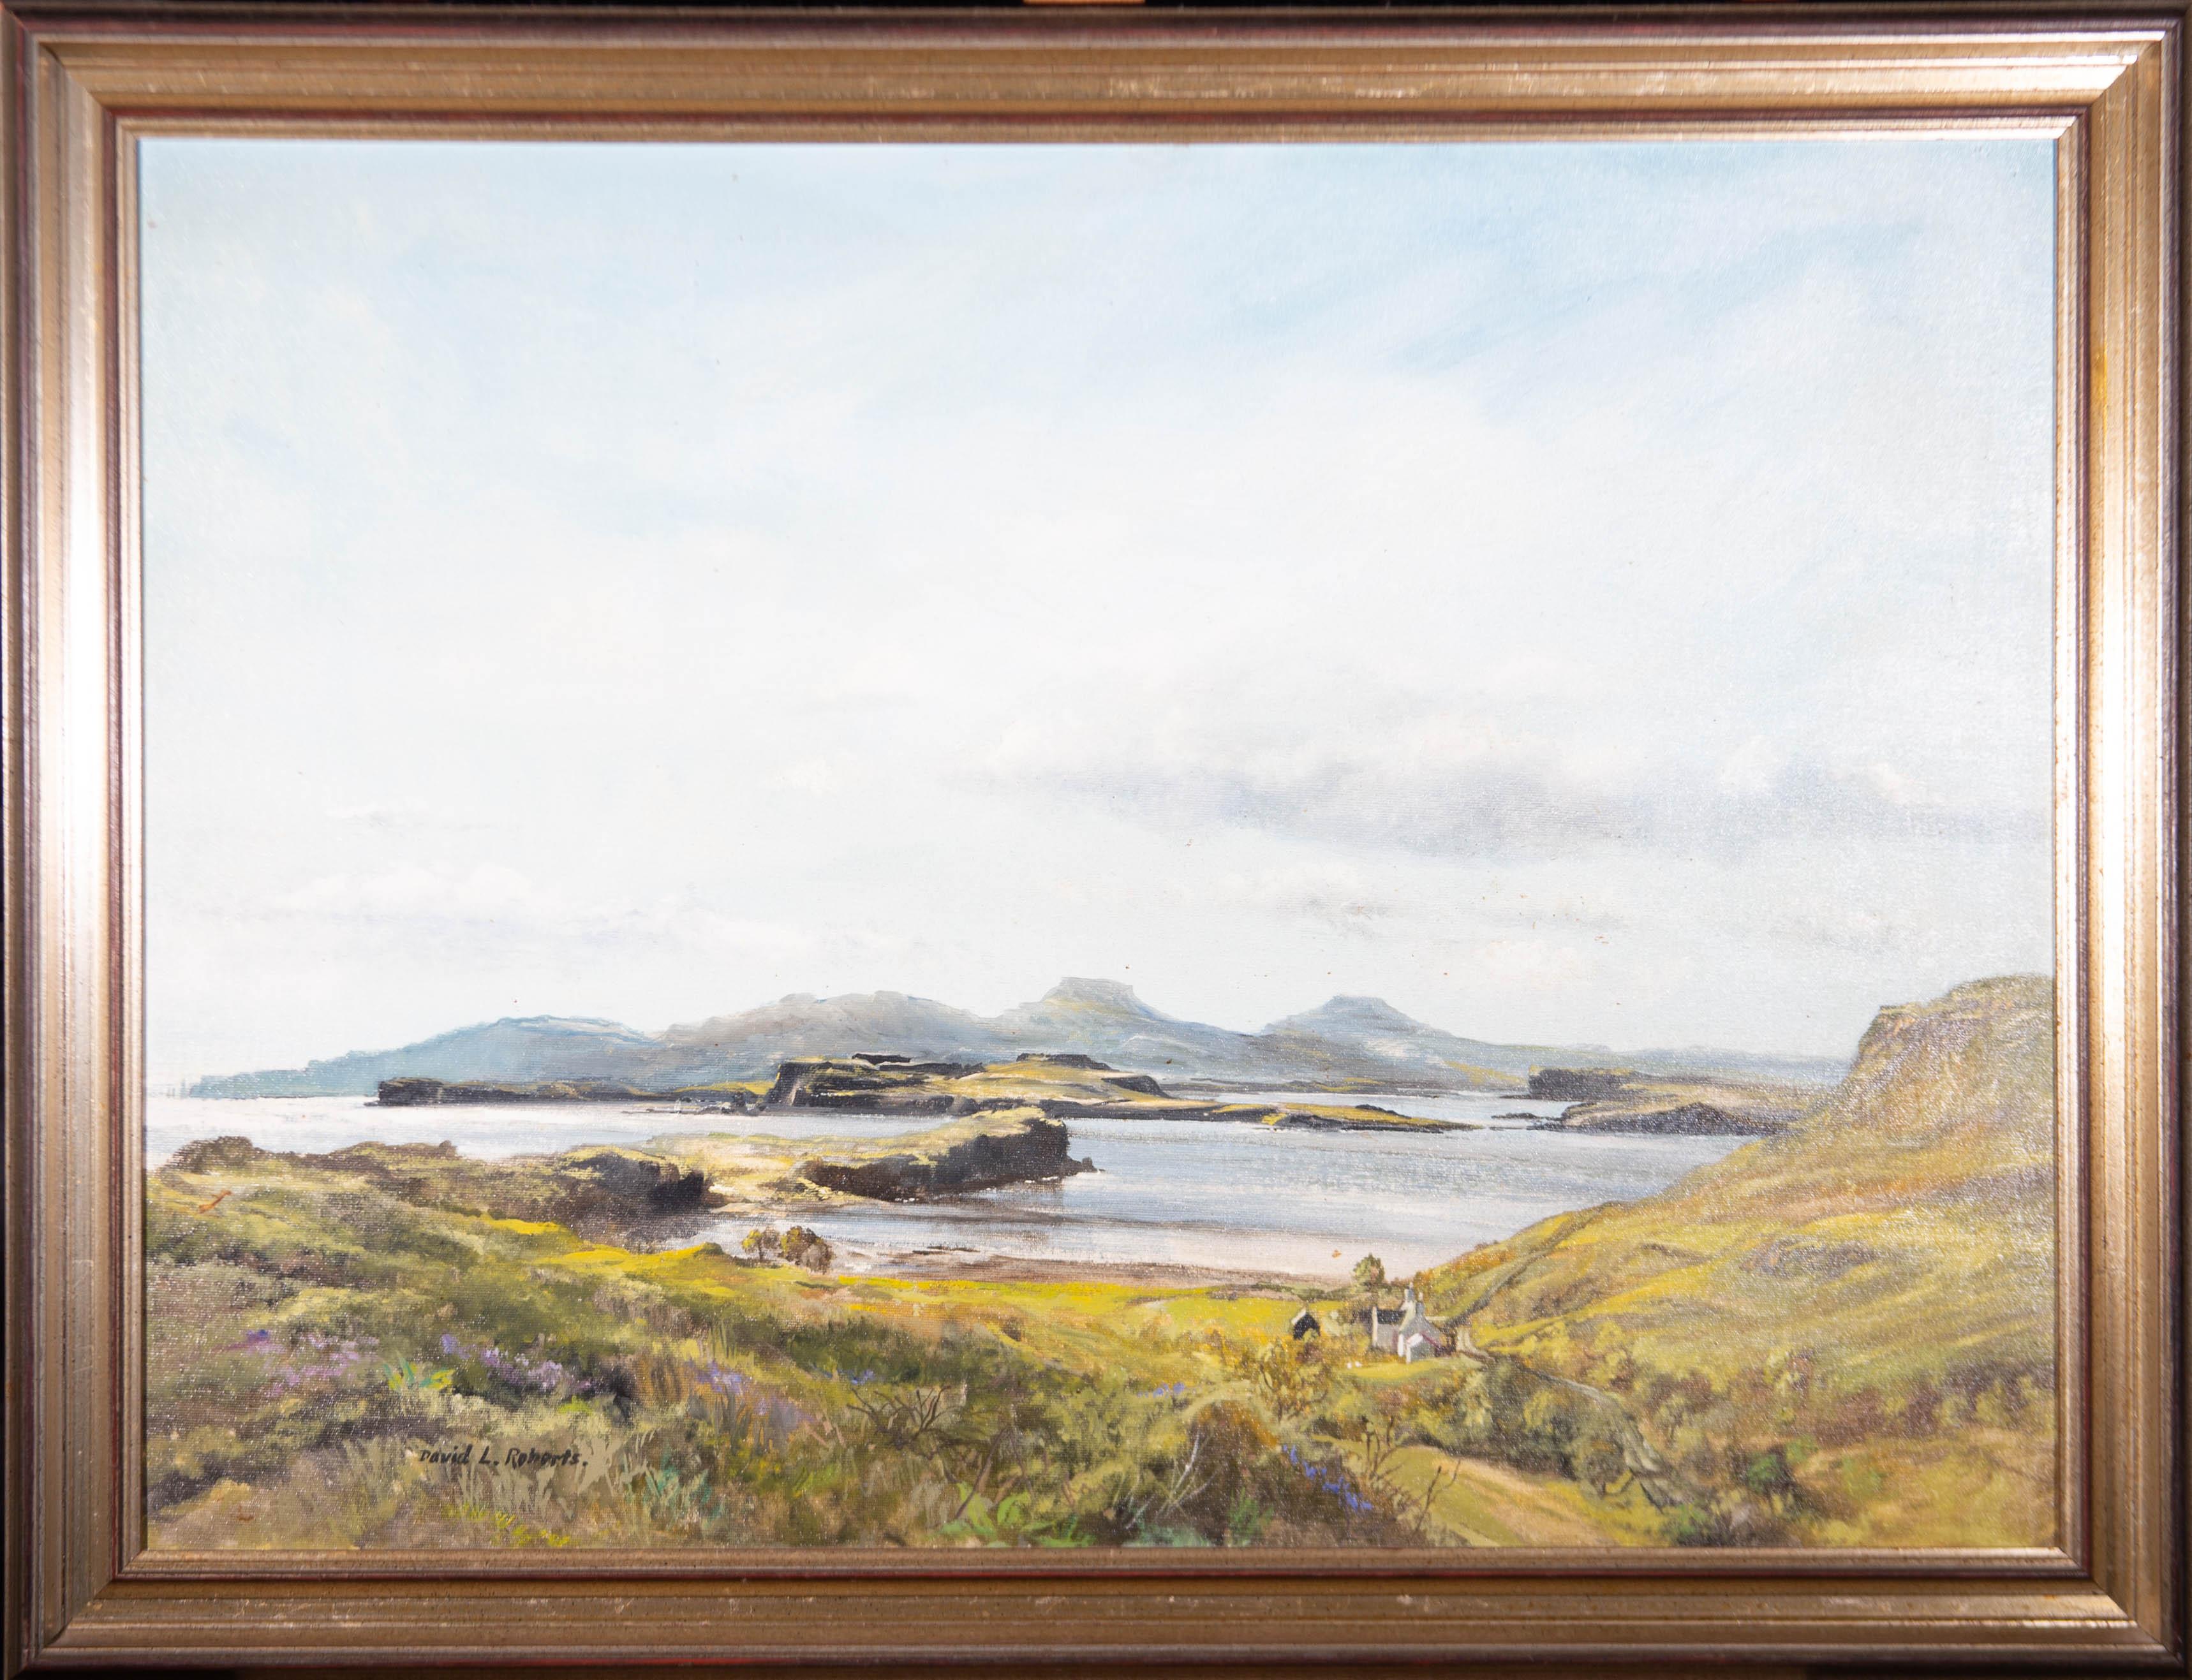 David L. Roberts (1934-1997) - Large Oil, Duirinish Peninsula, Isle of Skye